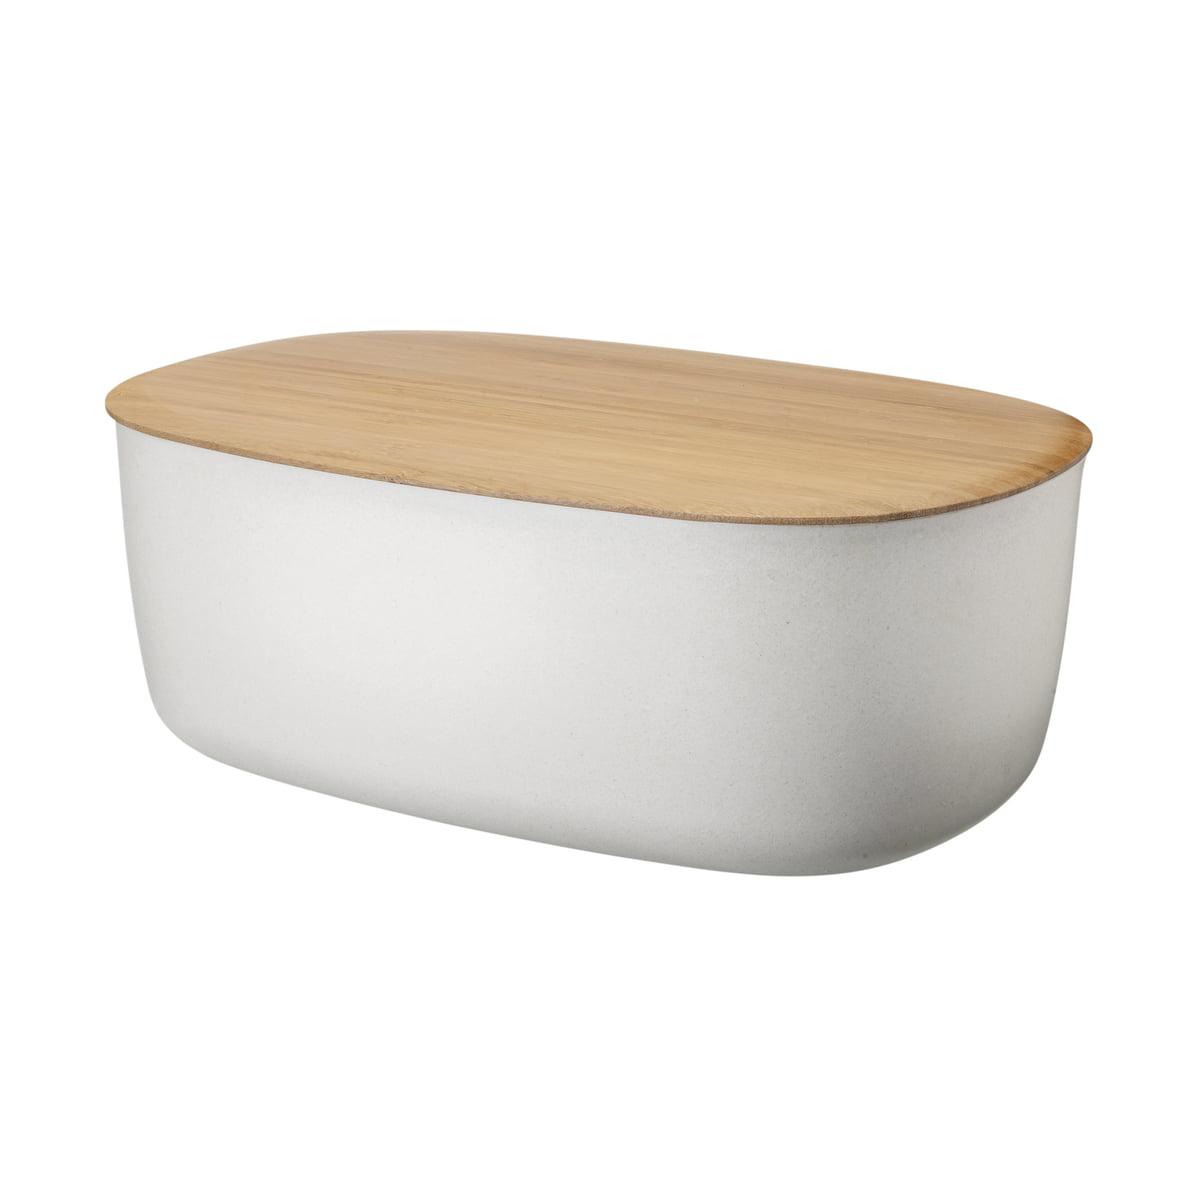 Stelton Rig-Tig by Stelton - Box-It Boîte à pain, blanche nature